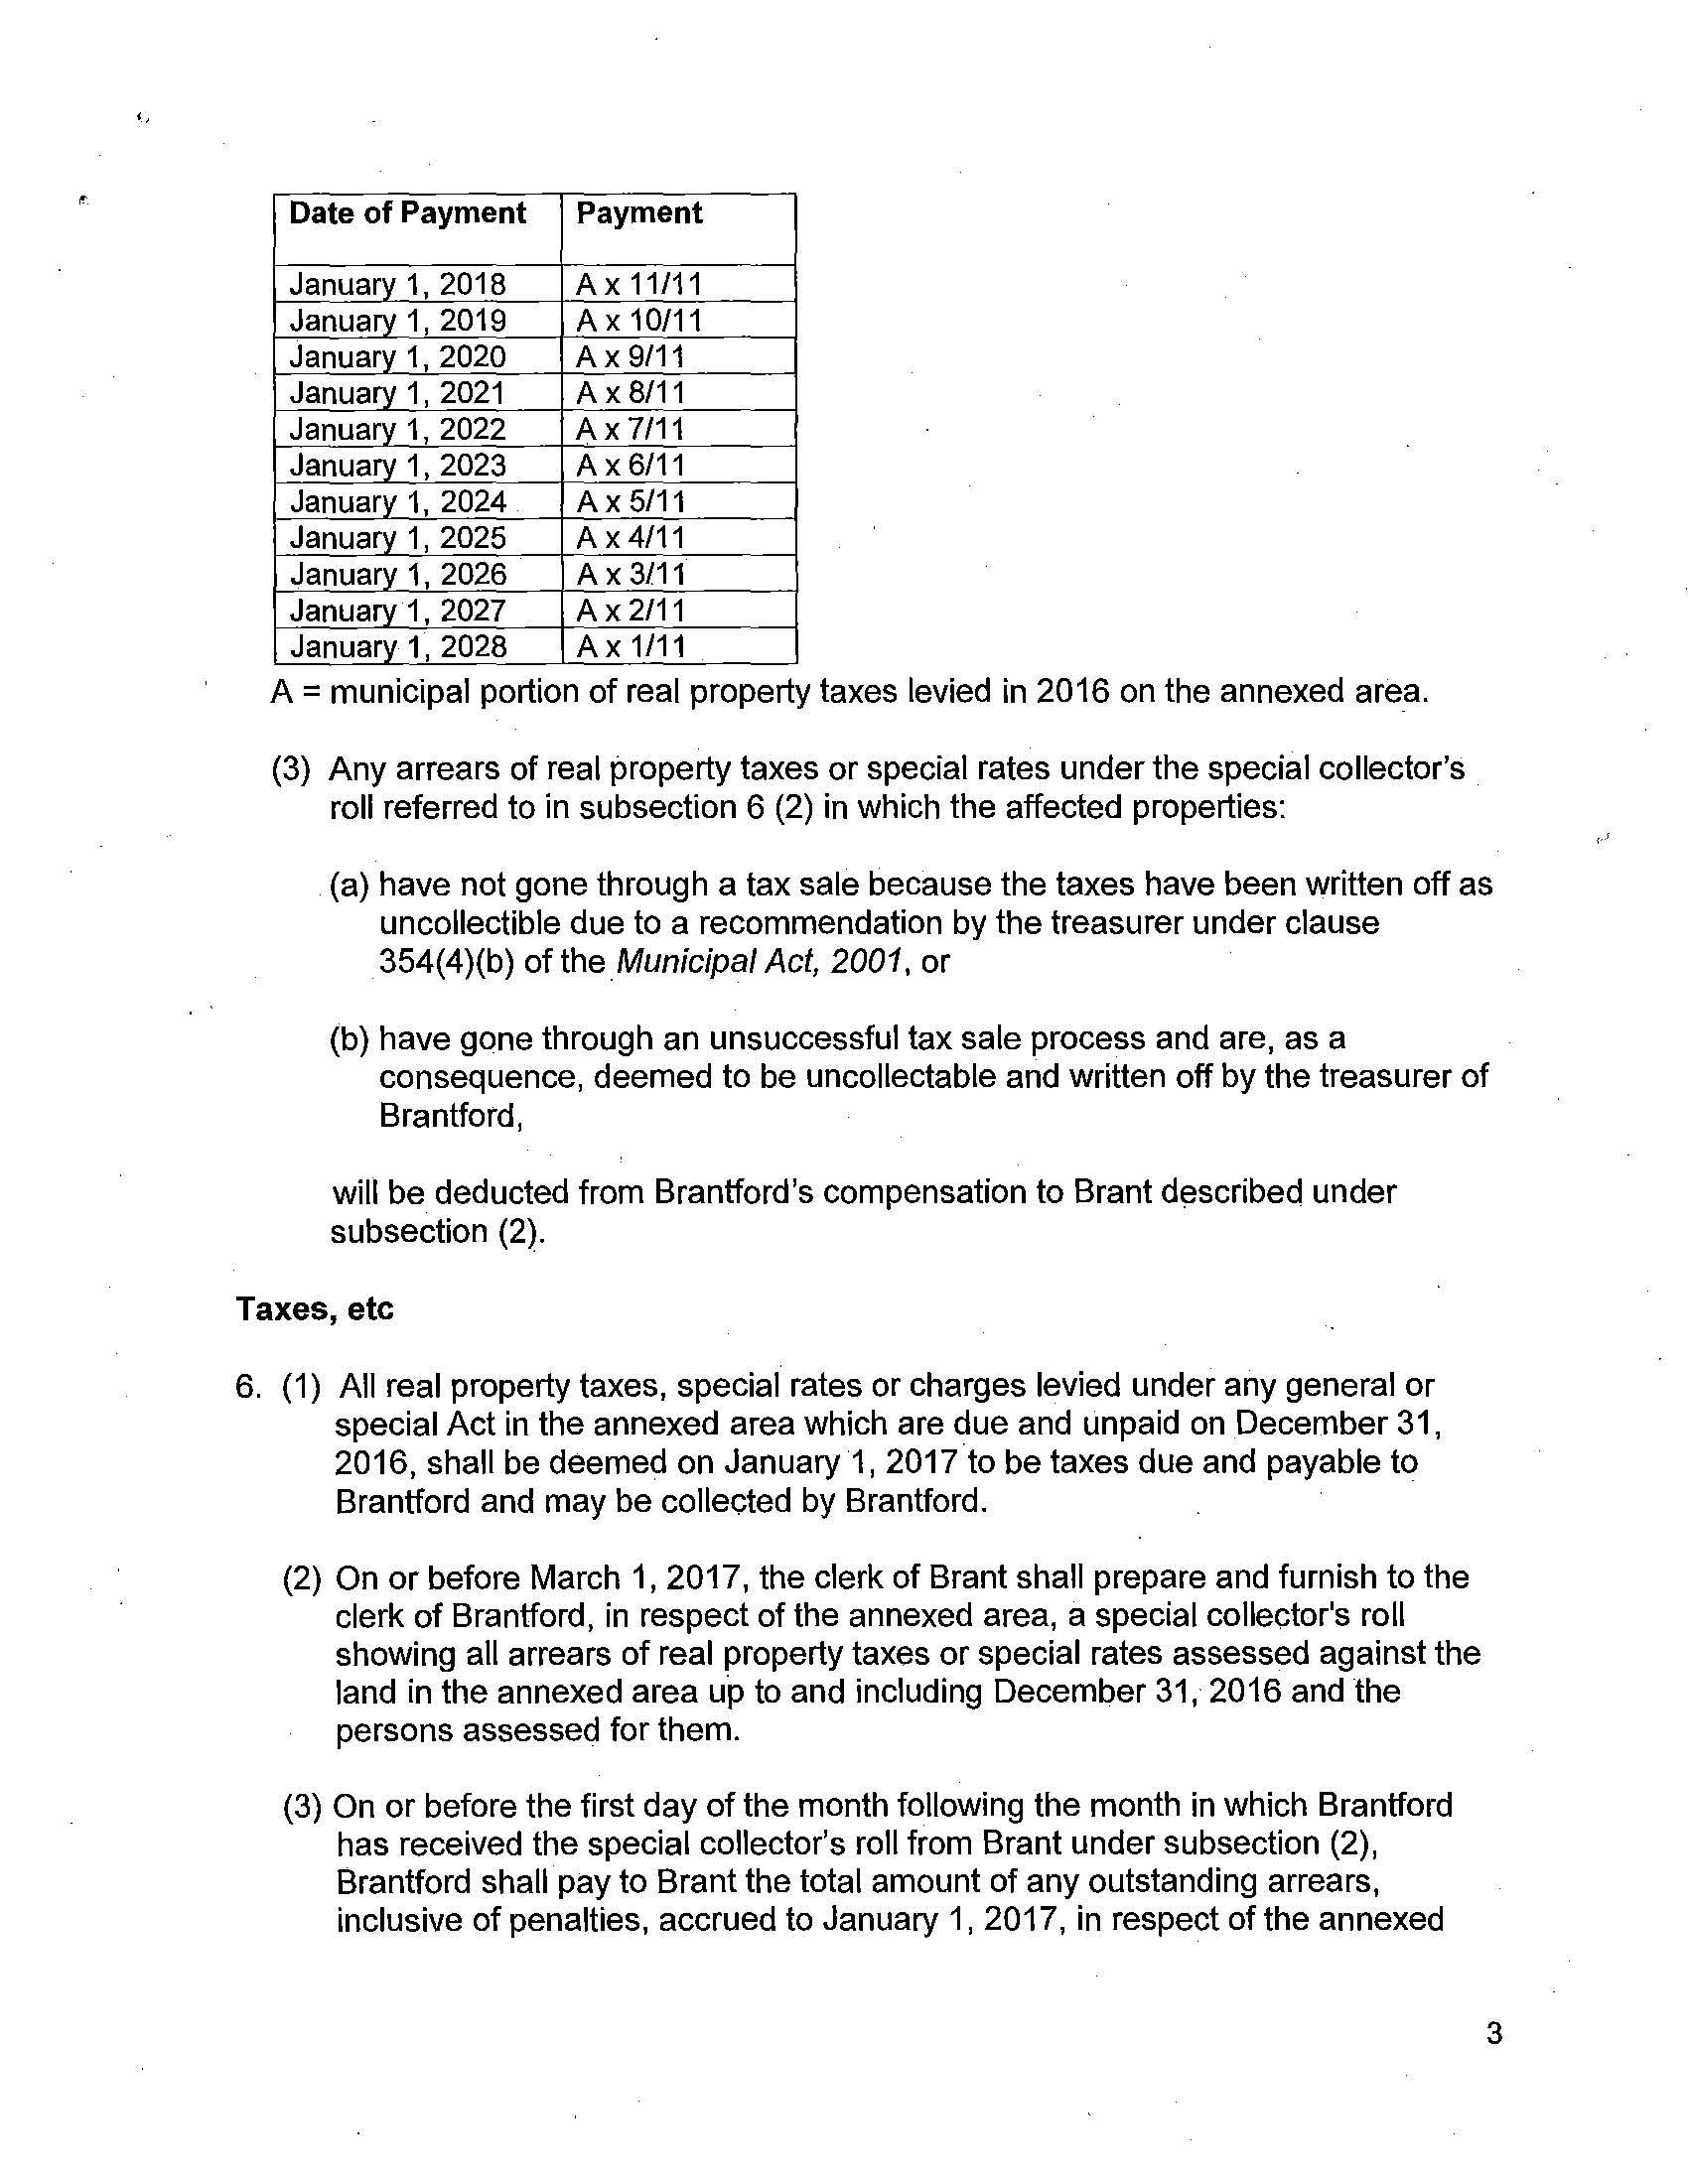 Brantford_Boundary_Signed_Order_Page_03.jpg